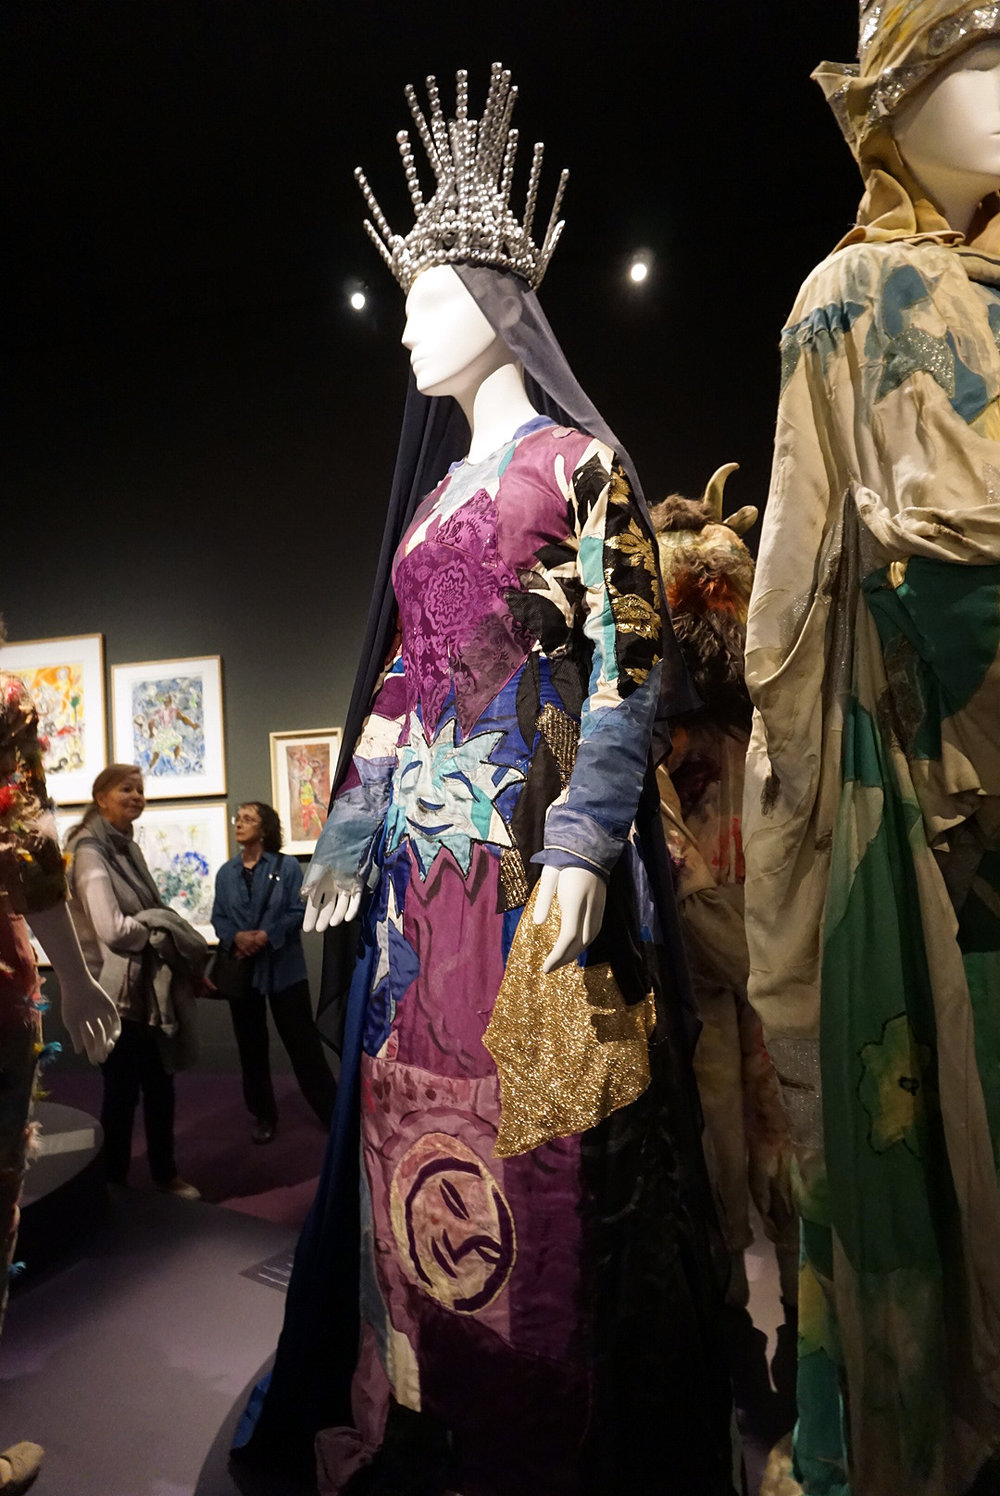 Montreal-Museum-Of-Fine-Art-Canada-Travel-Blogger-Photography-LINDATENCHITRAN-28-1616x1080.jpg